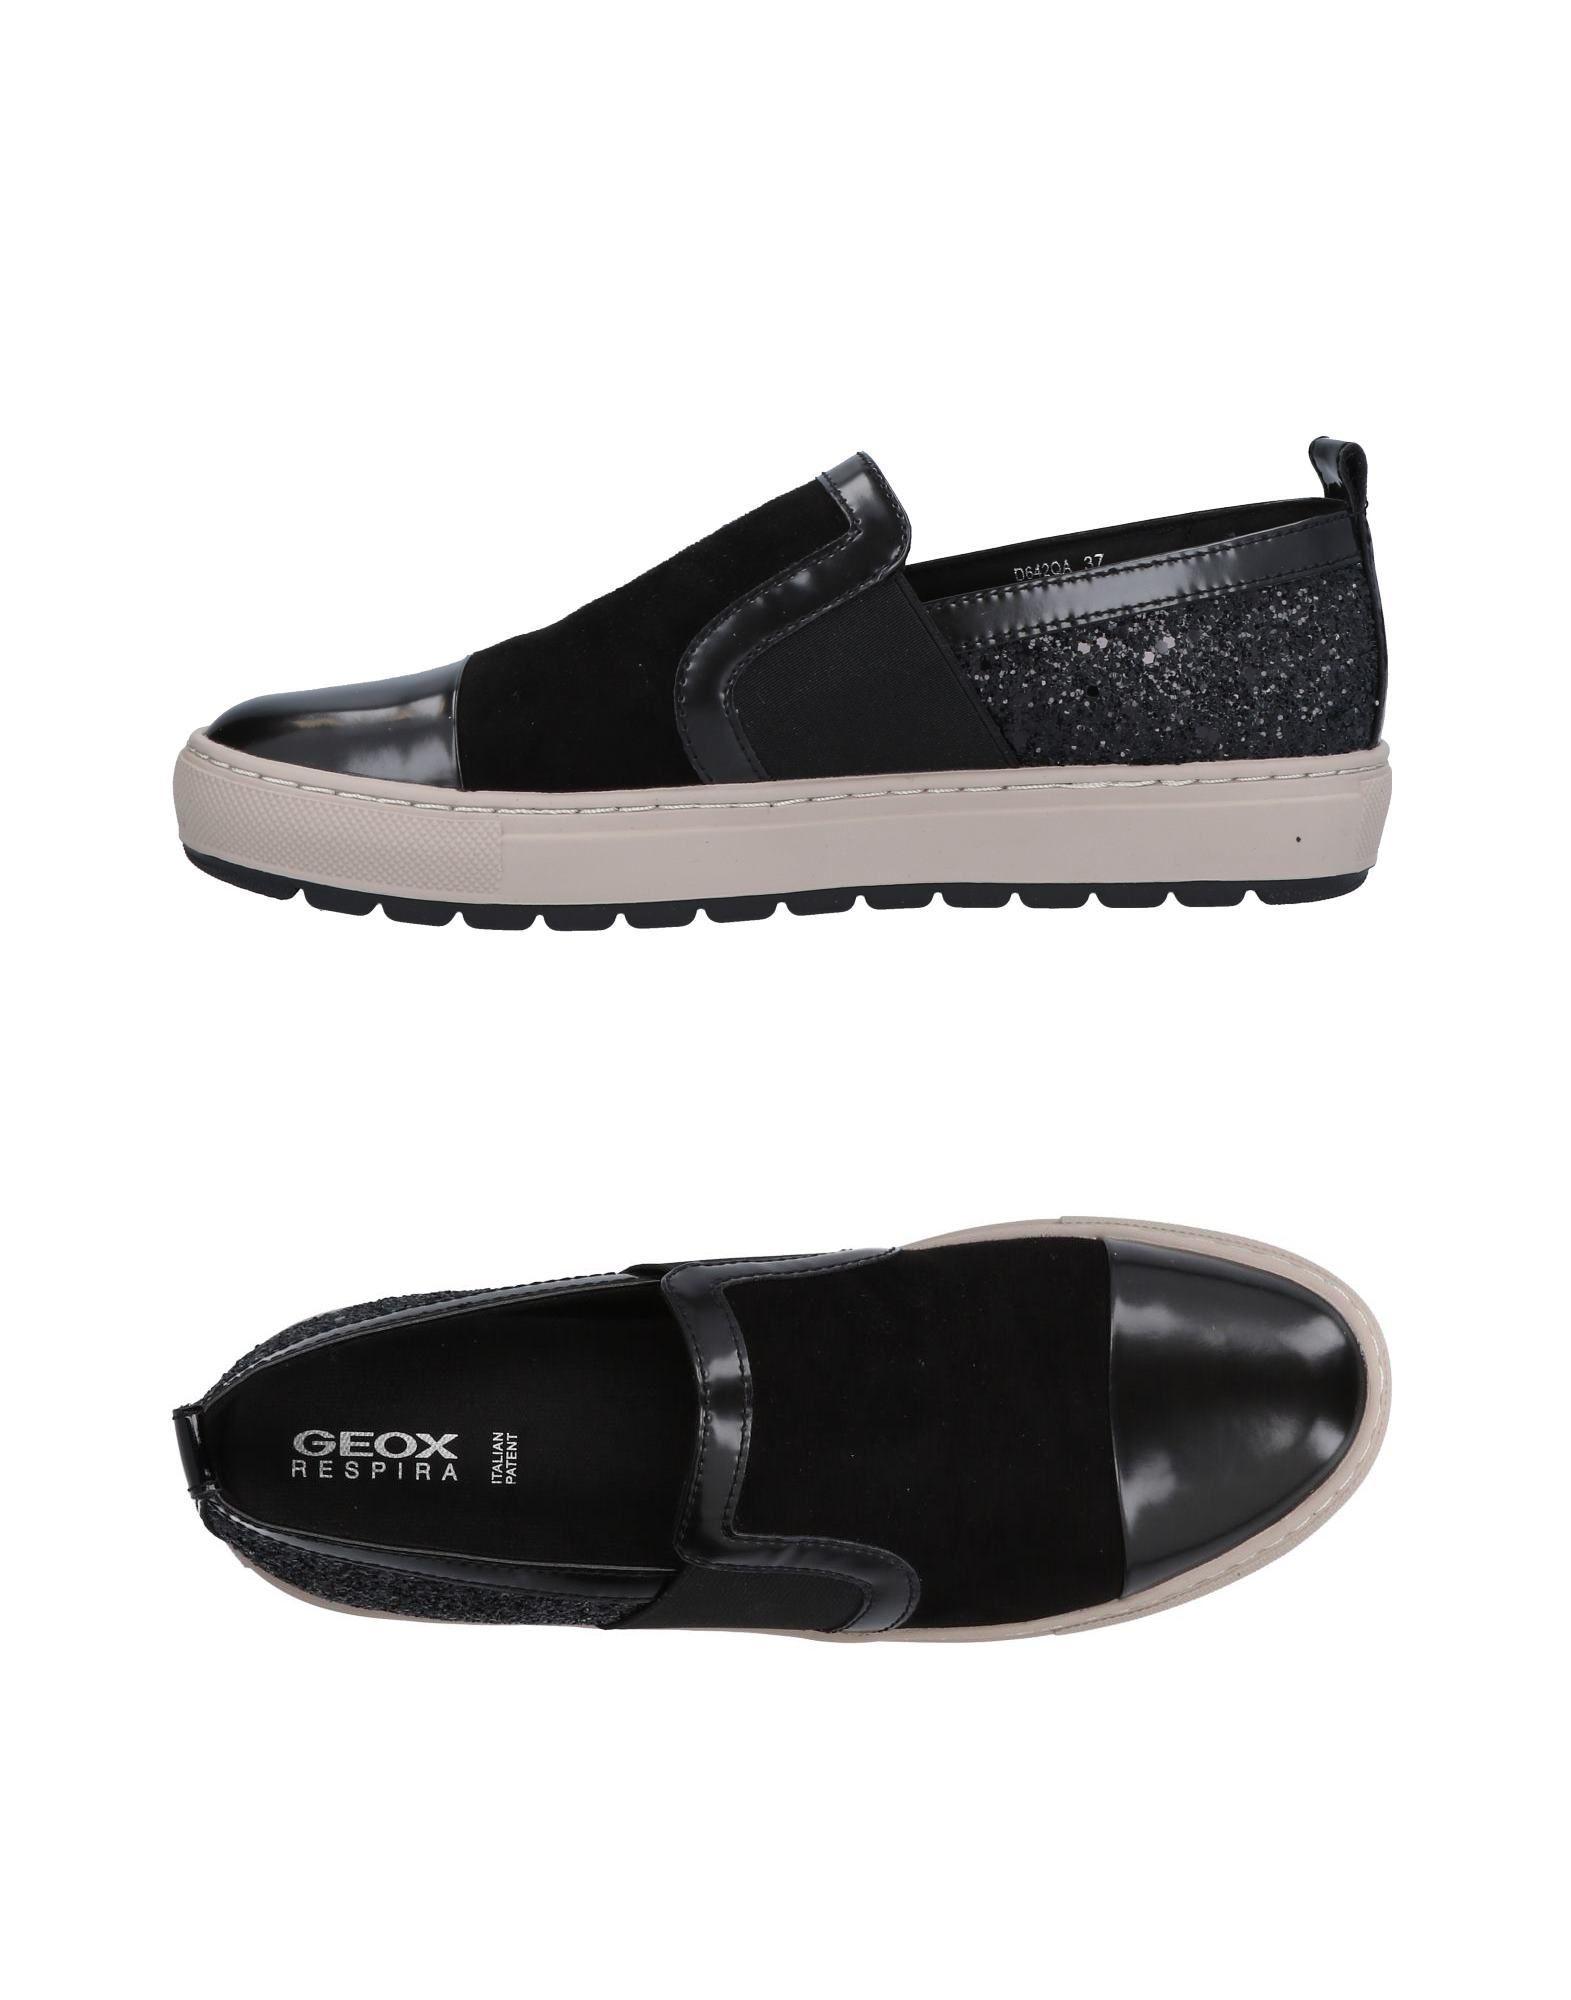 Geox Sneakers Damen  11110781OD Gute Qualität beliebte Schuhe